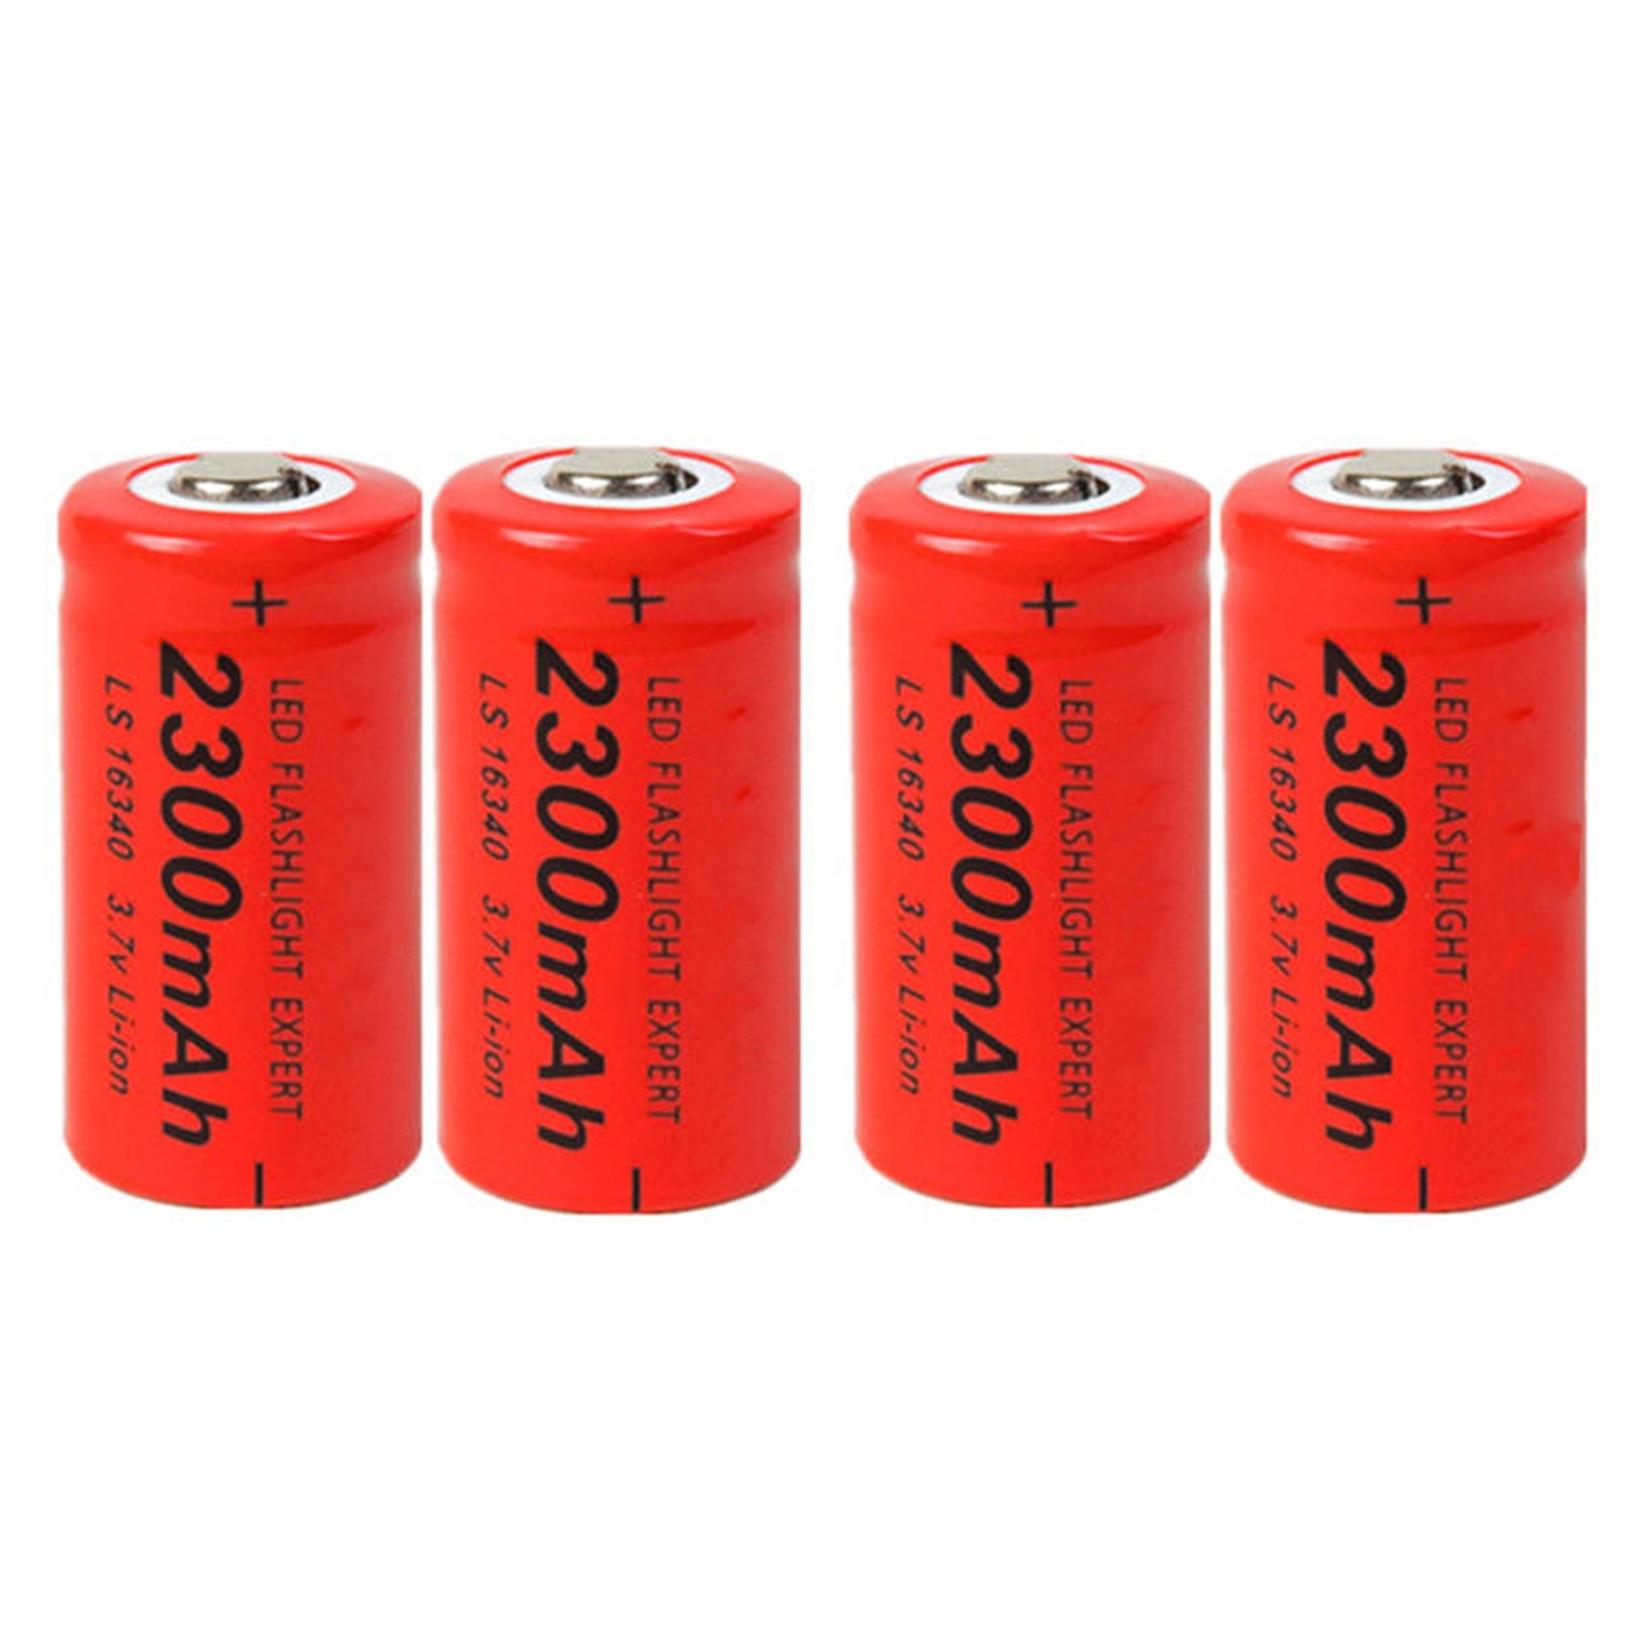 4 Uds 2300mAh 16340 Li-ion CR123A batería recargable roja para linterna